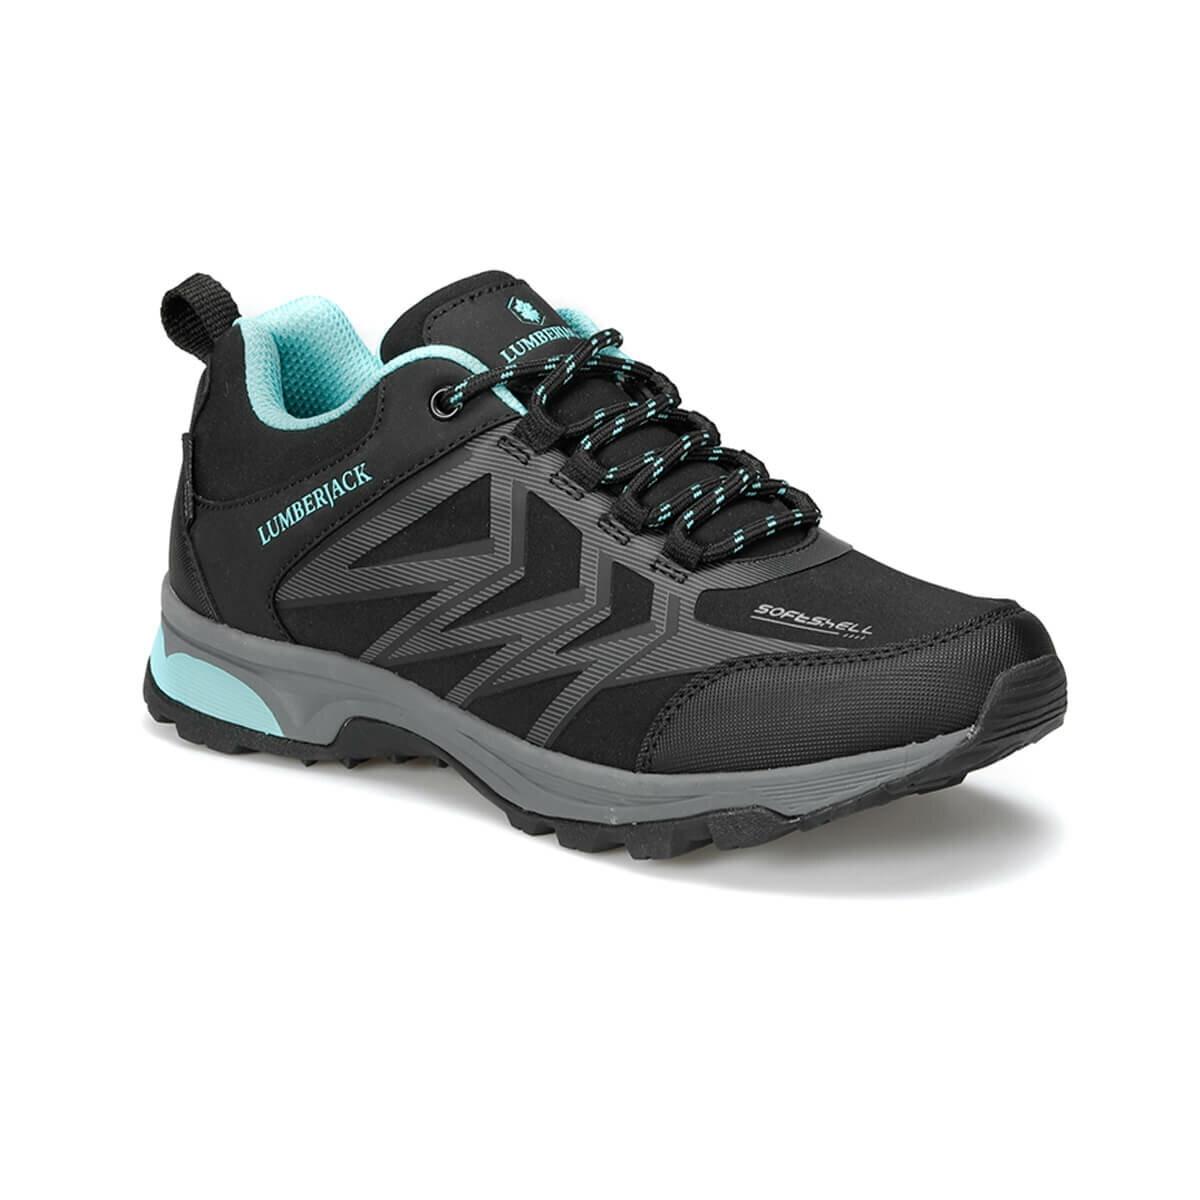 FLO STOWE WMN 9PR Black Women 'S Outdoor Shoes LUMBERJACK